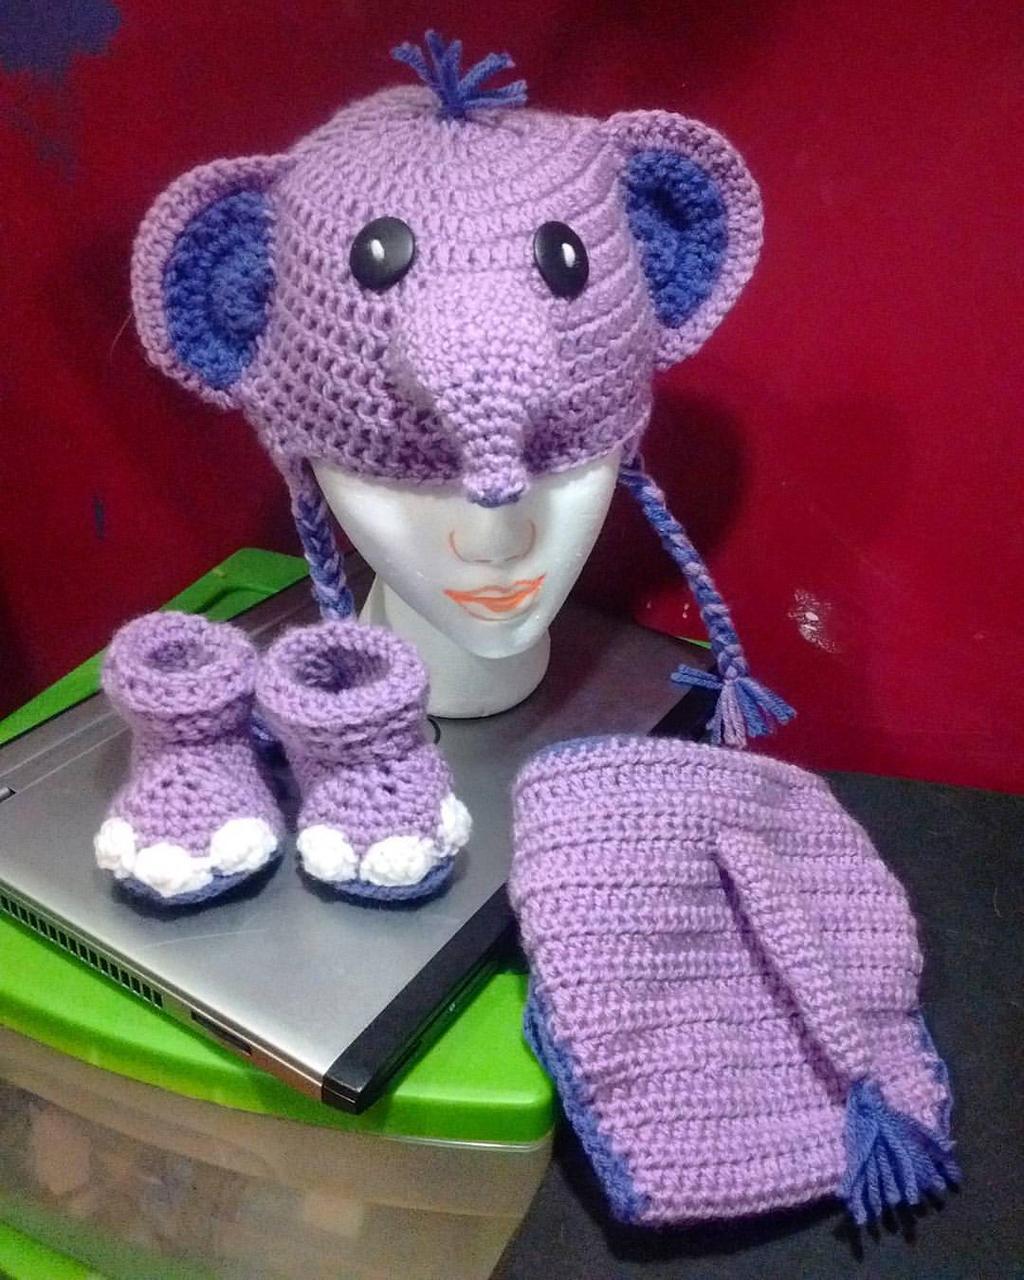 Aruba Sea Blue Handmade Elephant Hat and Diaper Cover Crochet | Etsy | 1280x1024